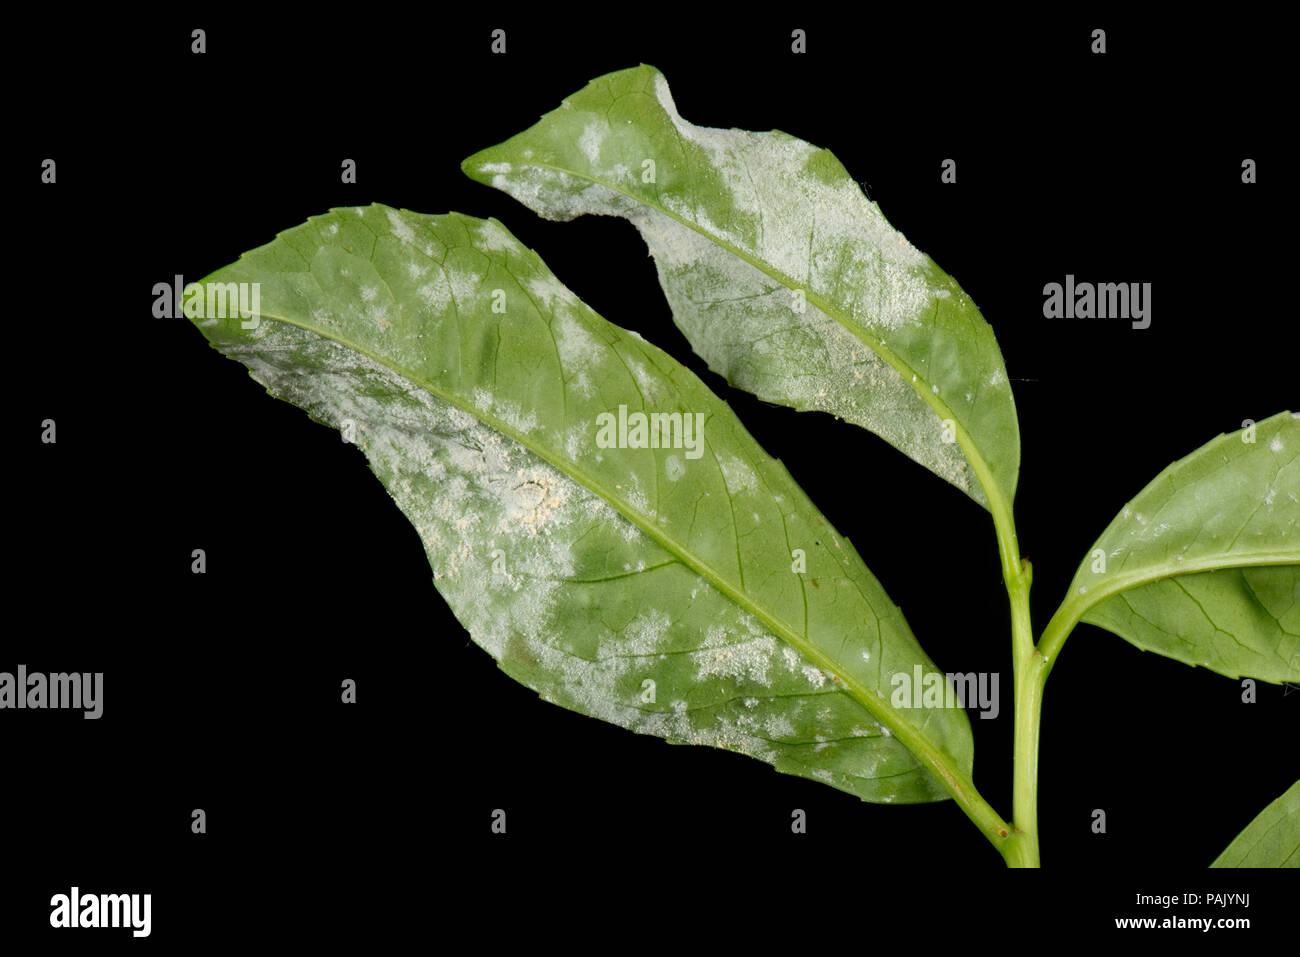 Powdery mildew, Podosphaera pannosa or tridactyla, on cherry laurel leaf undersides in a garden hedge, July - Stock Image